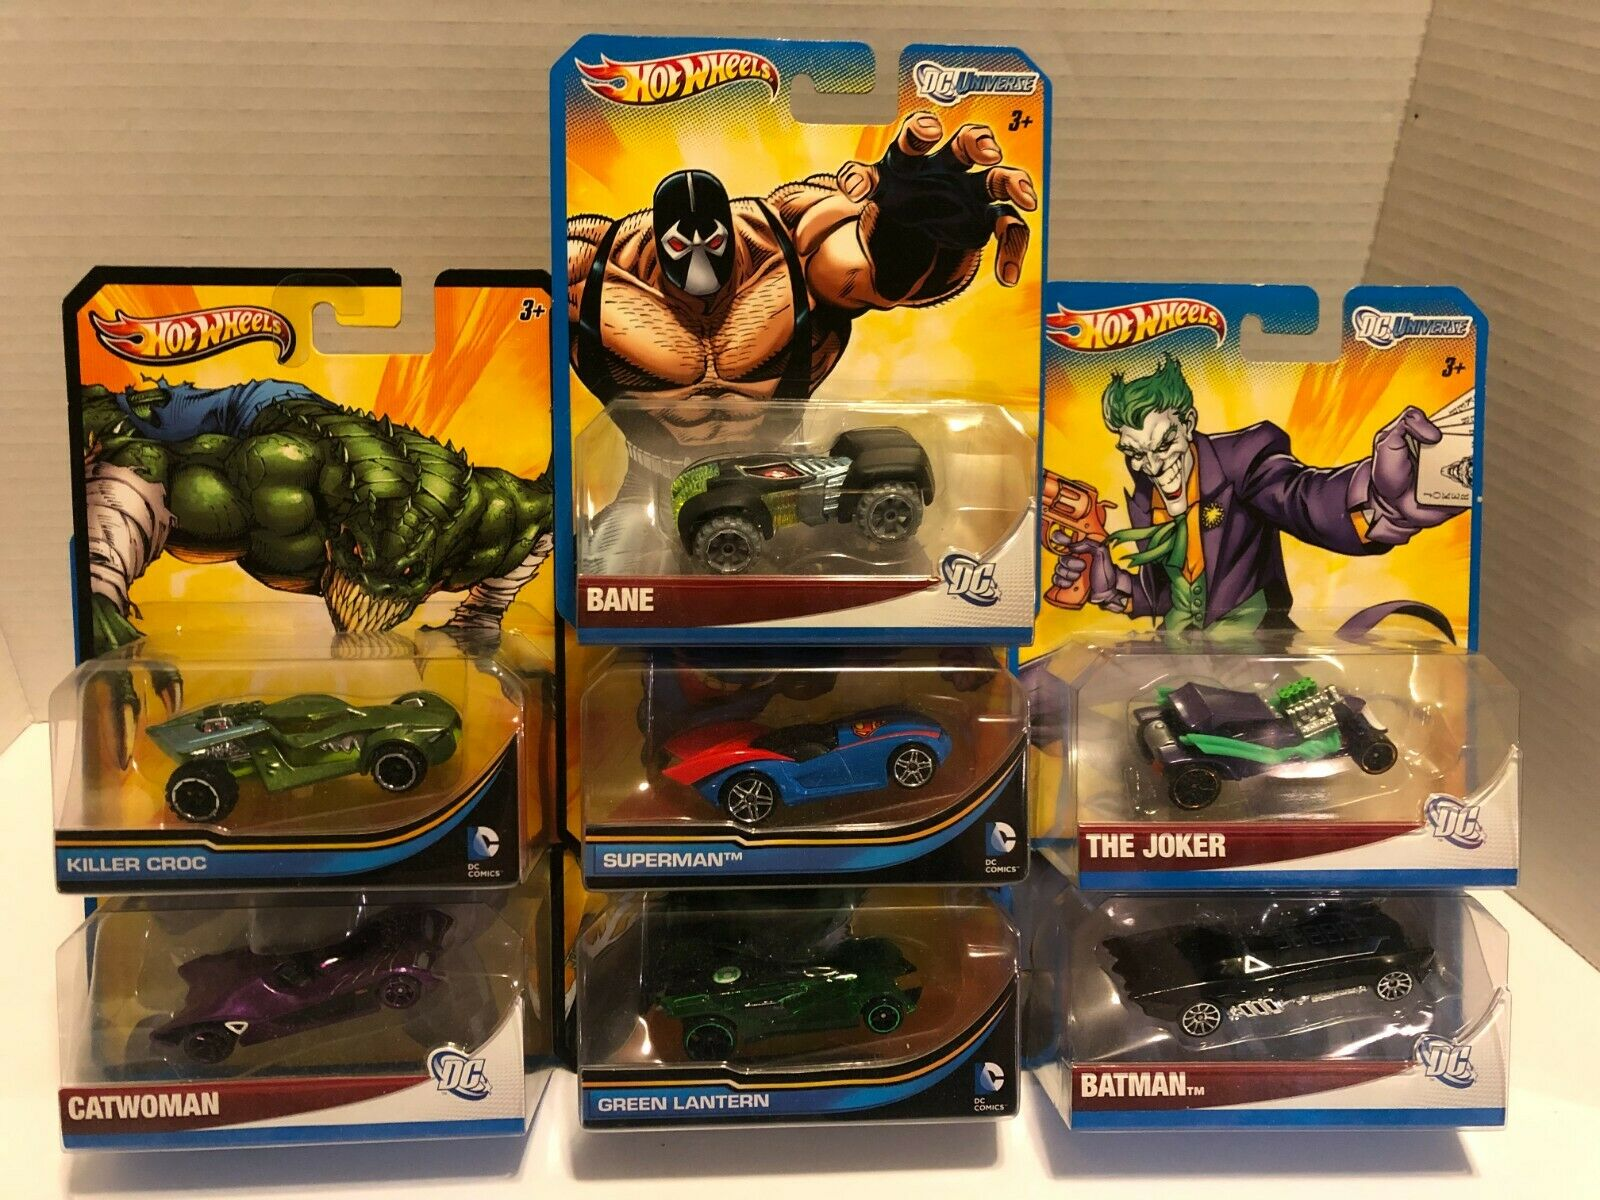 Hot Wheels - DC Comics 1 64 Scale - Lot Of 7 - Batman, Superman, The Joker, More - $7.99